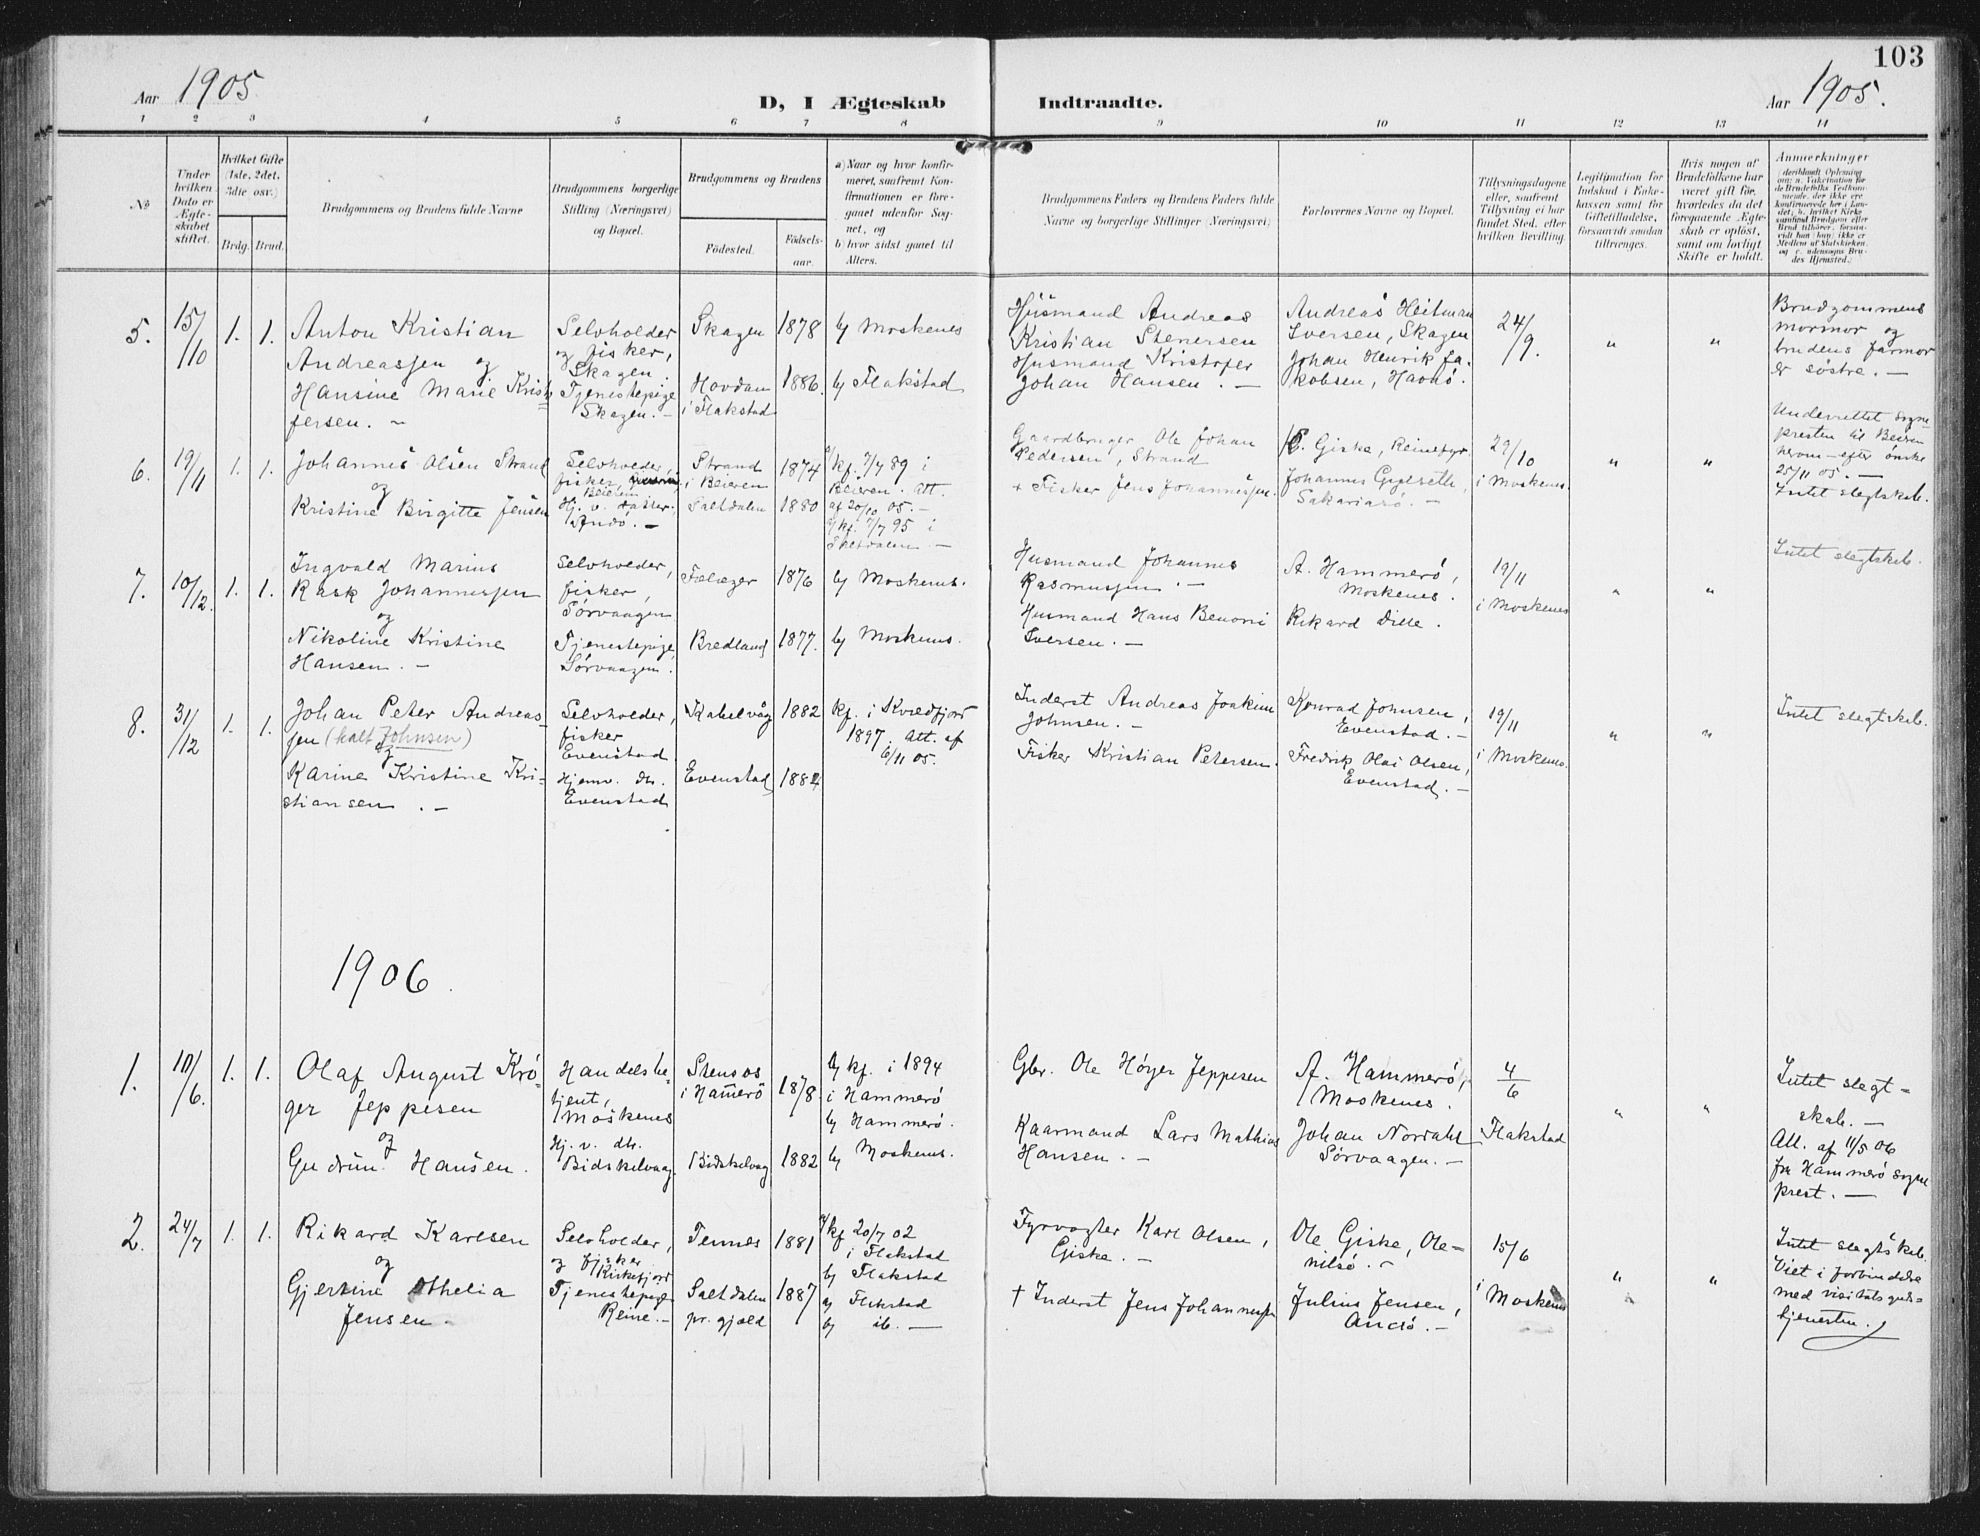 SAT, Ministerialprotokoller, klokkerbøker og fødselsregistre - Nordland, 886/L1221: Ministerialbok nr. 886A03, 1903-1913, s. 103